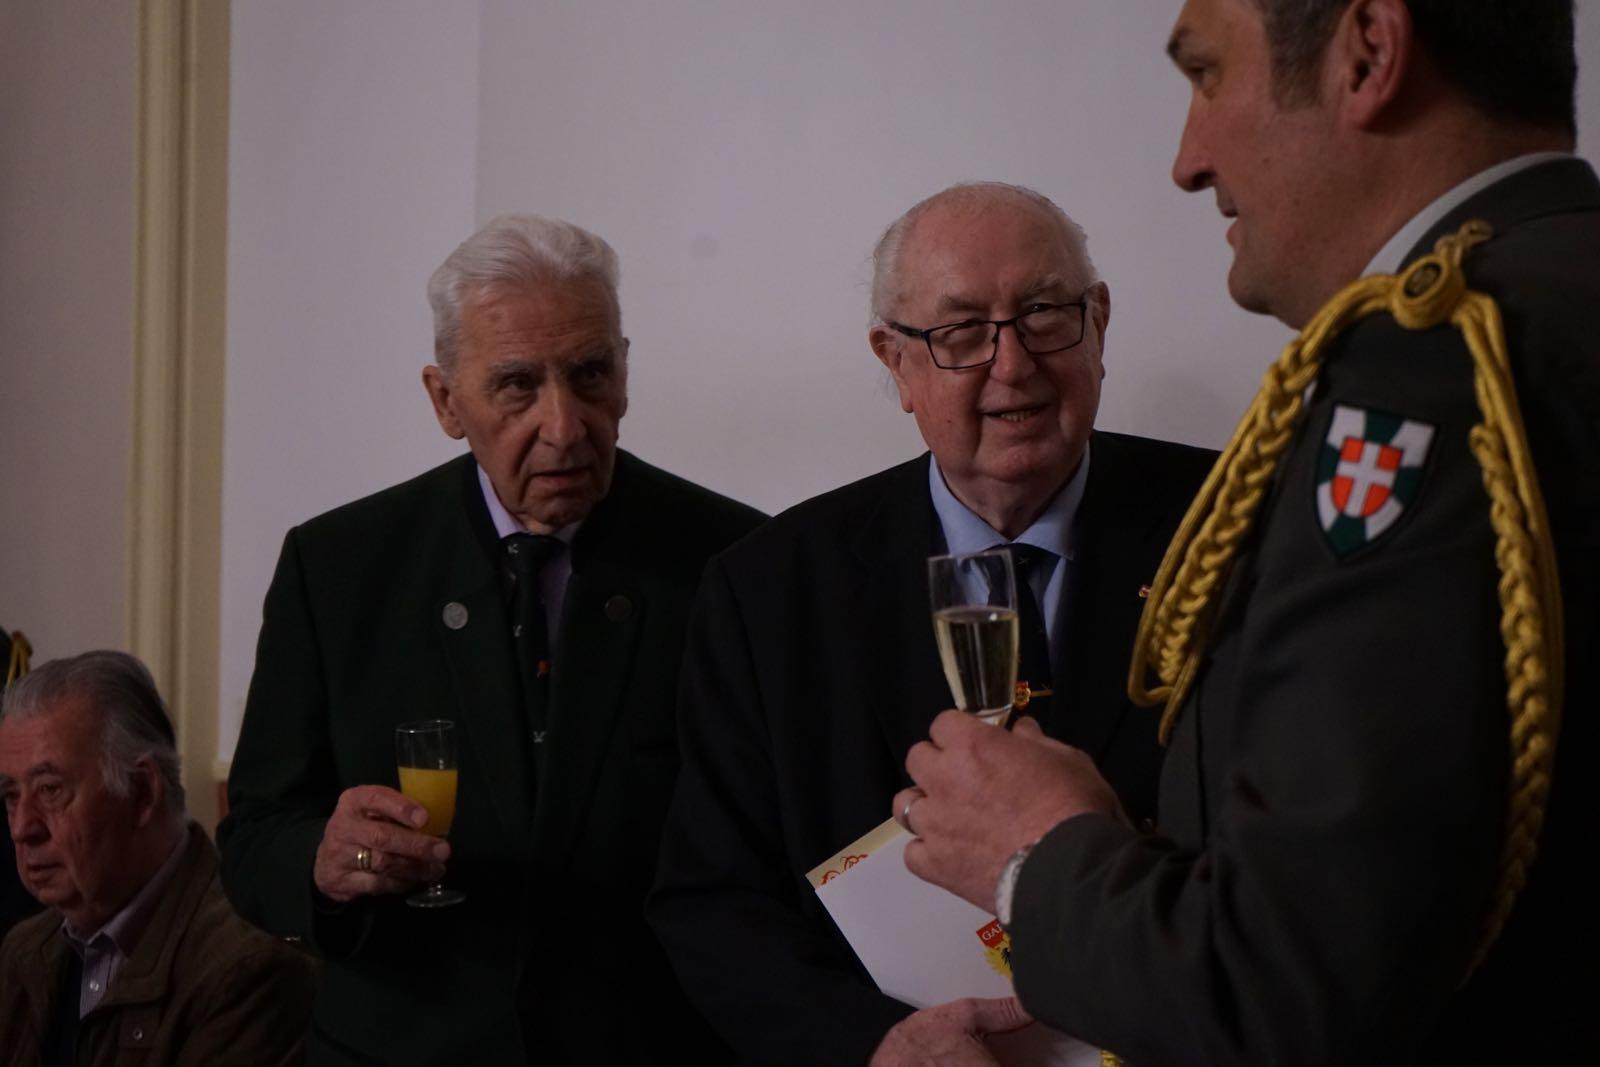 2019_04_02_Gardekameradschaft_Versammlung_MTK - 52 of 56